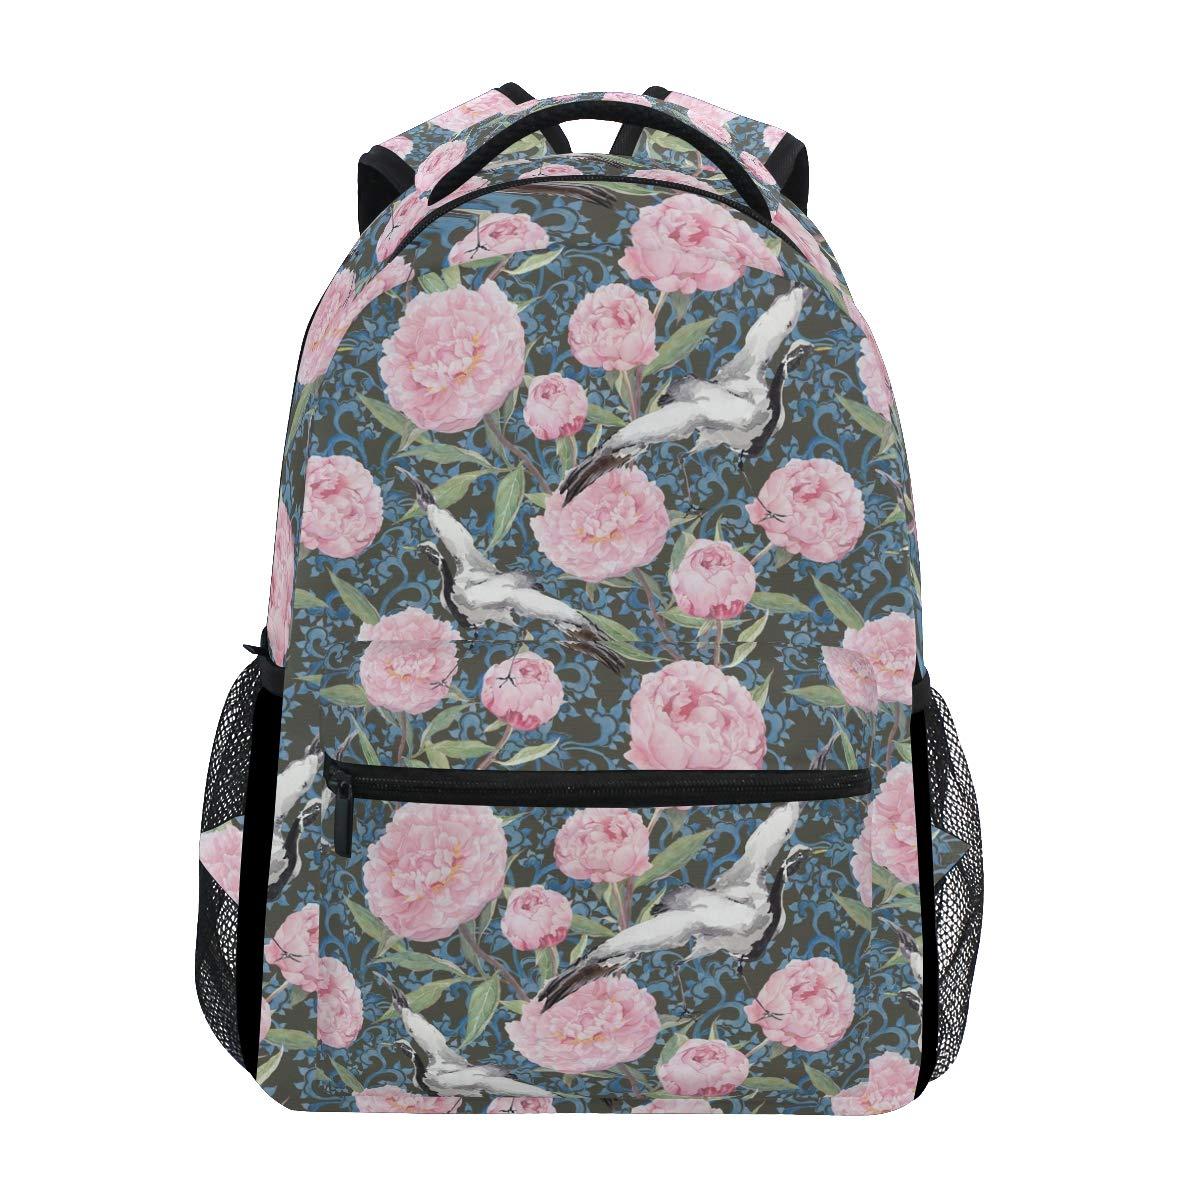 Sac d'école Backpacks Crane Birds Peony Flowers Bookbags Bag for Girls Kids Elementary